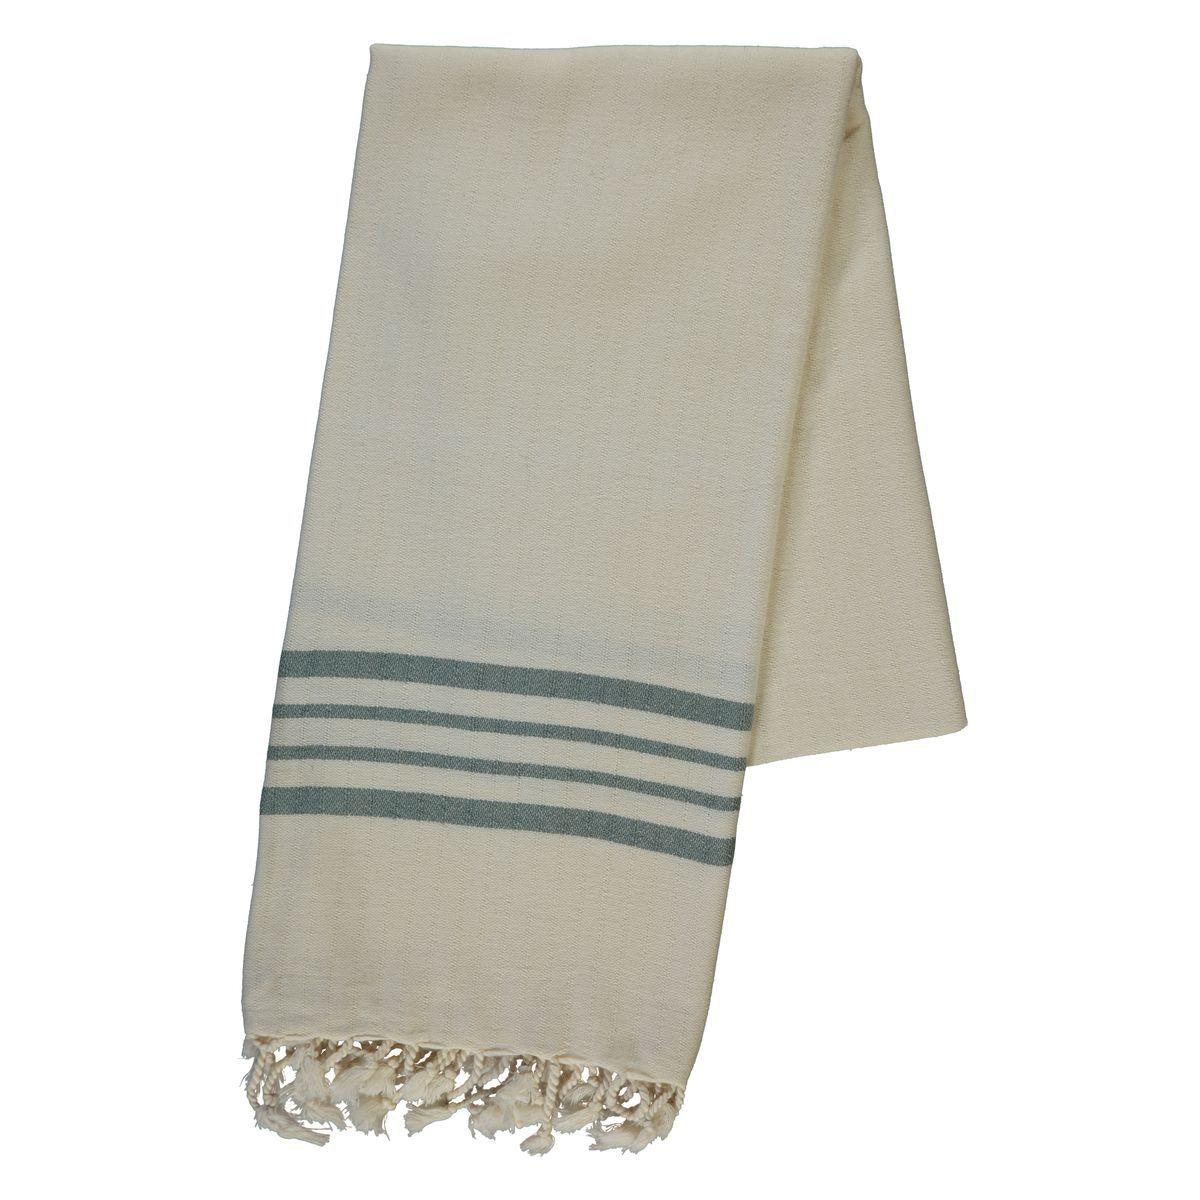 Peshtemal Sultan - Almond Green Stripes